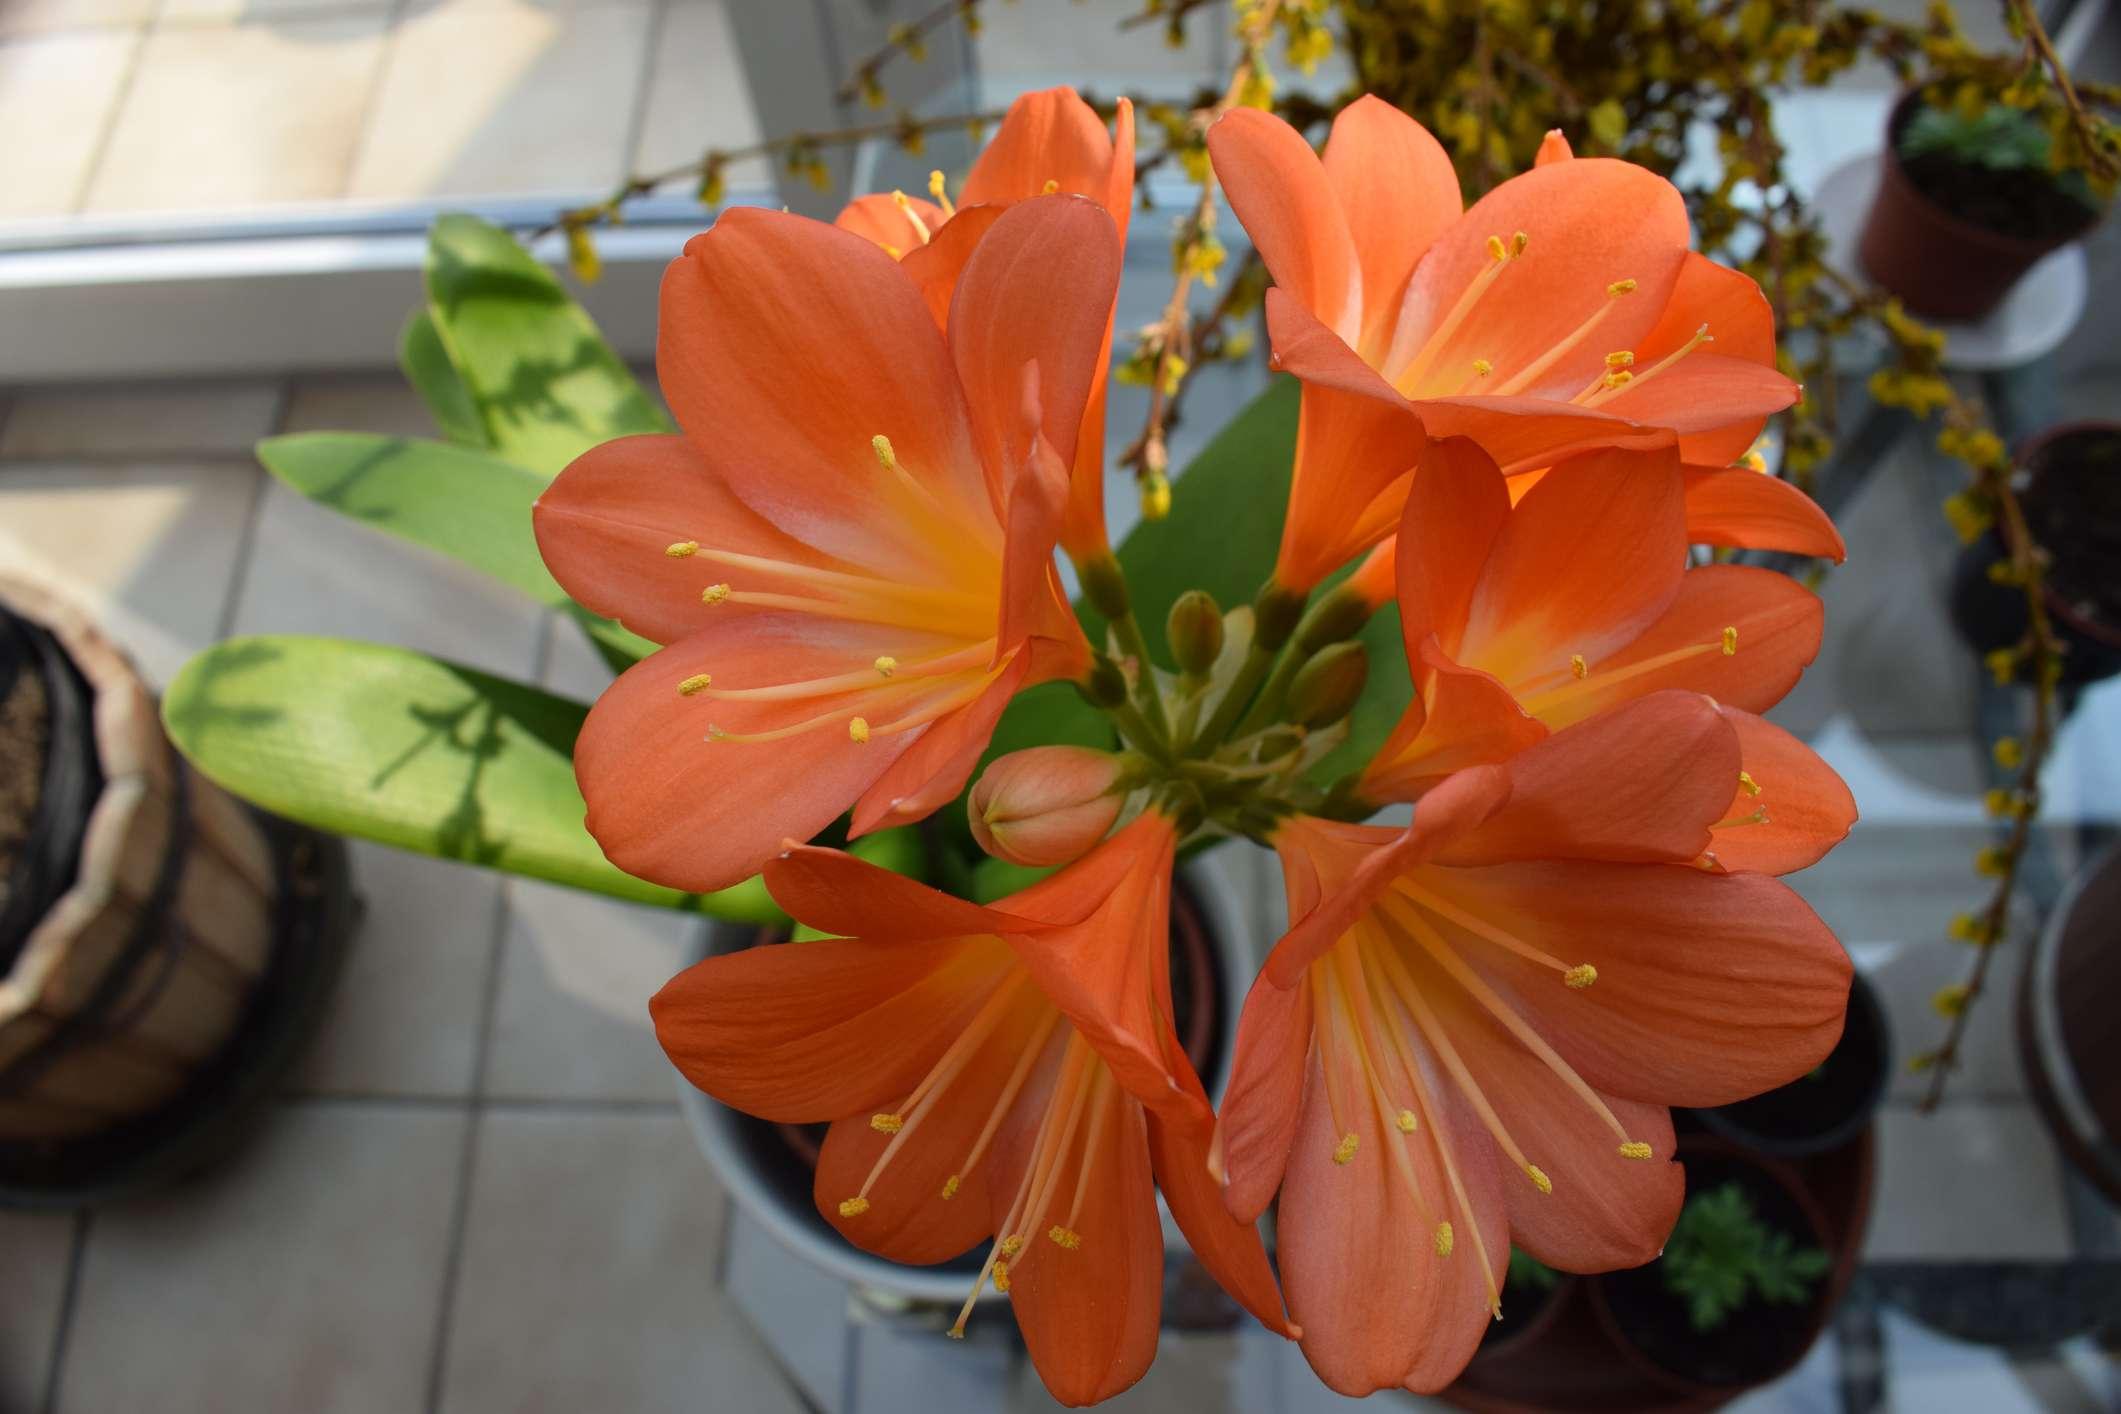 Clivia miniata (bush lily) growing indoors